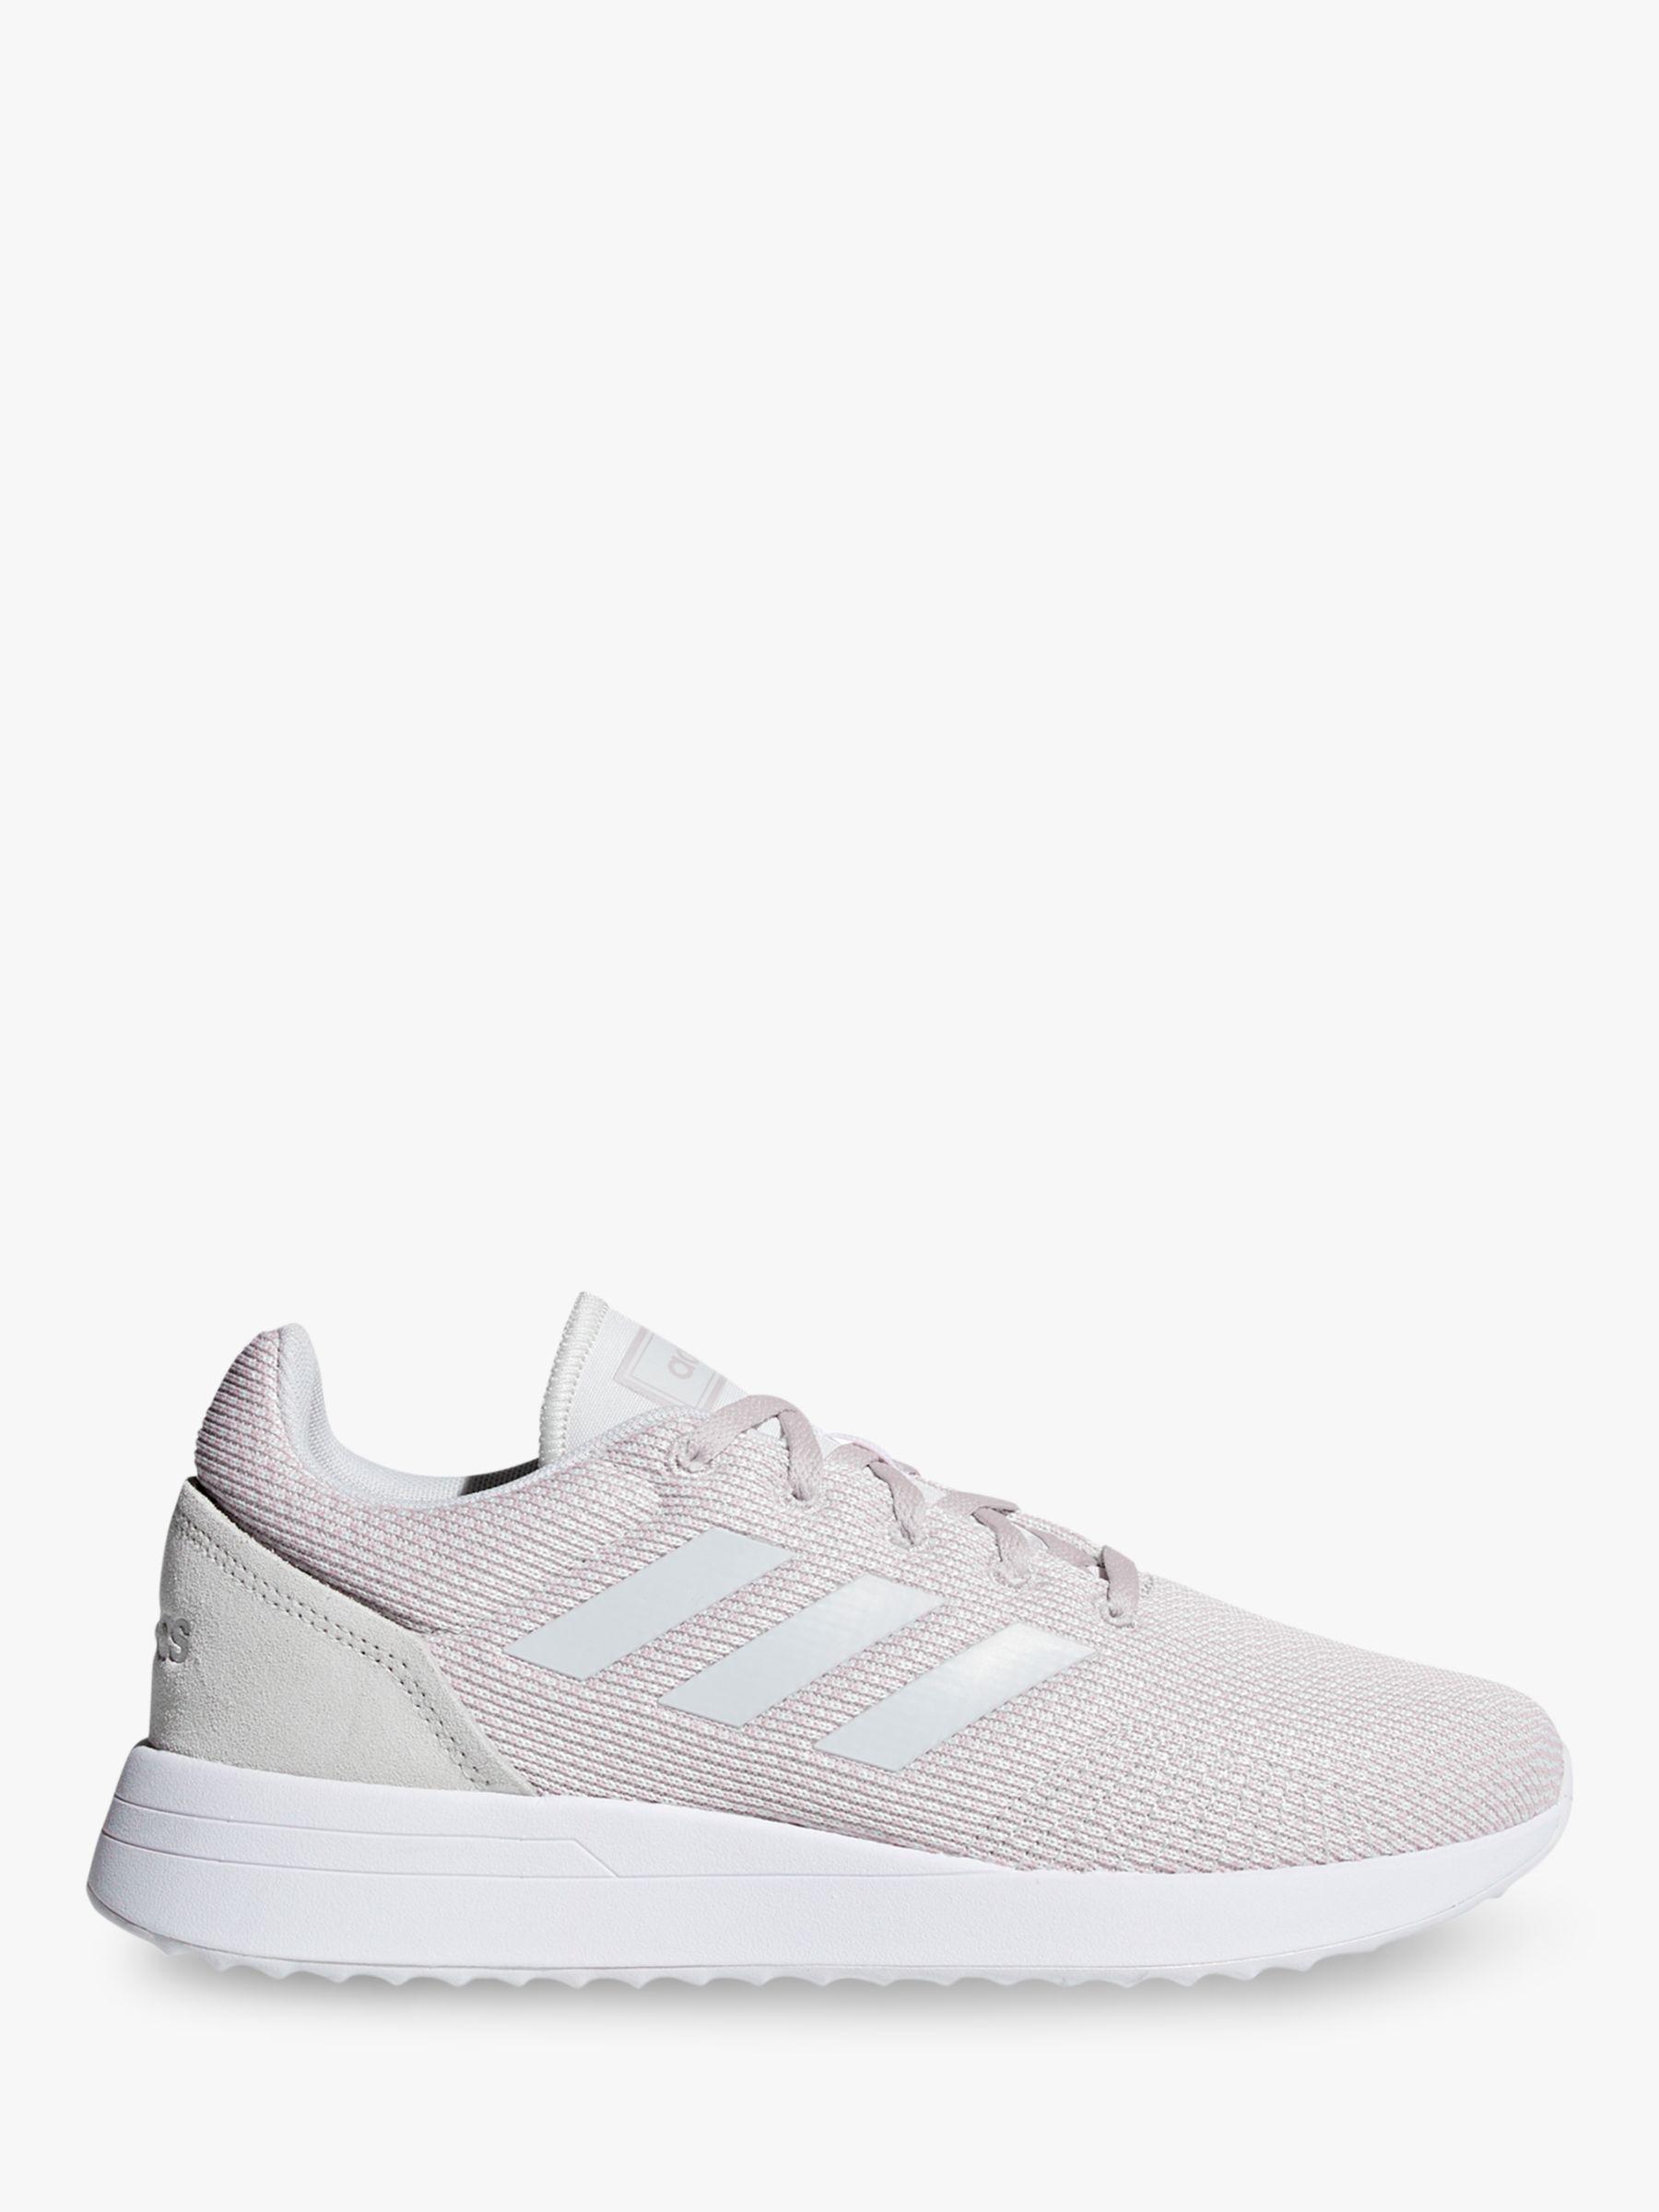 adidas light pink trainers